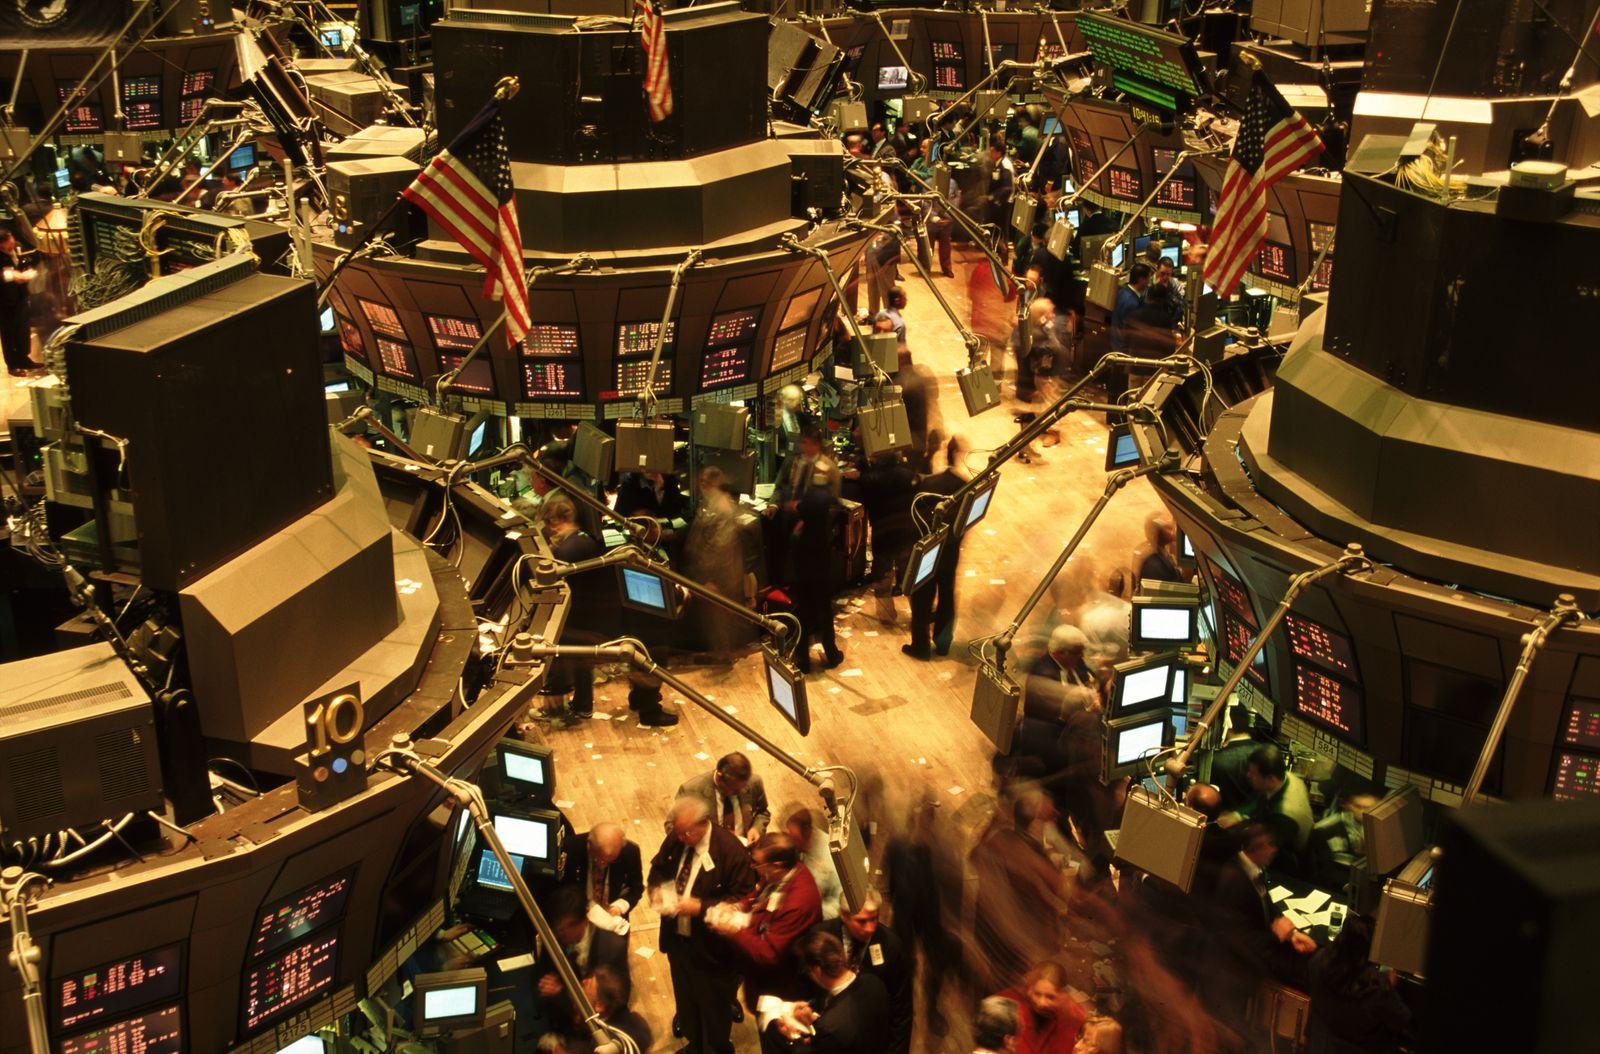 NICHT MEHR VERWENDEN! - Trading Floor of The New York Stock Exchange